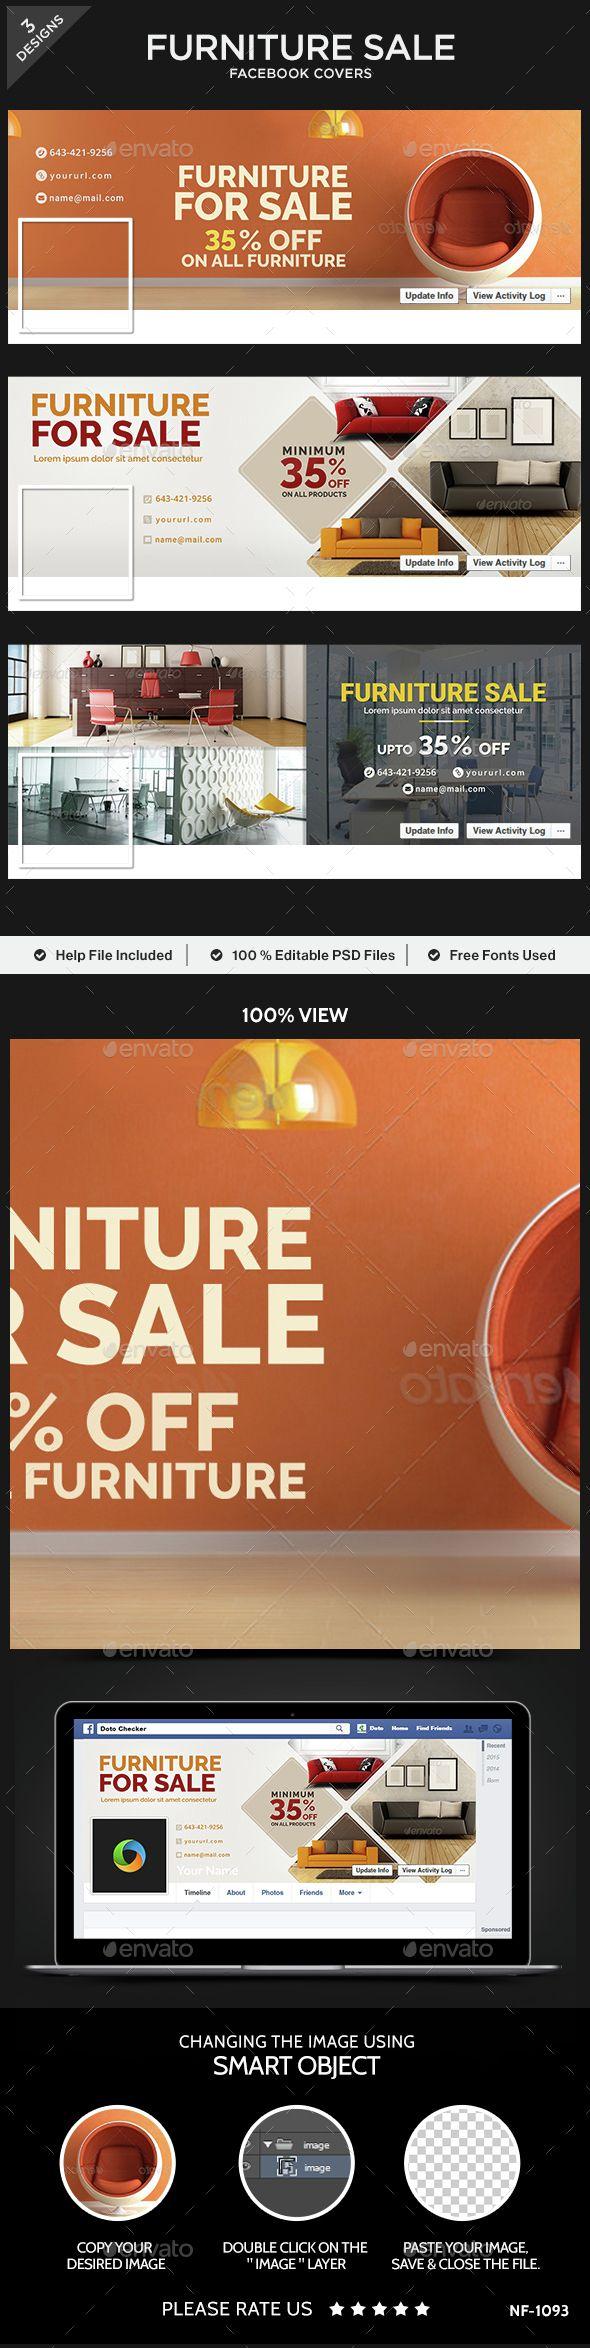 Furniture Sale Facebook Covers  - 3 Designs